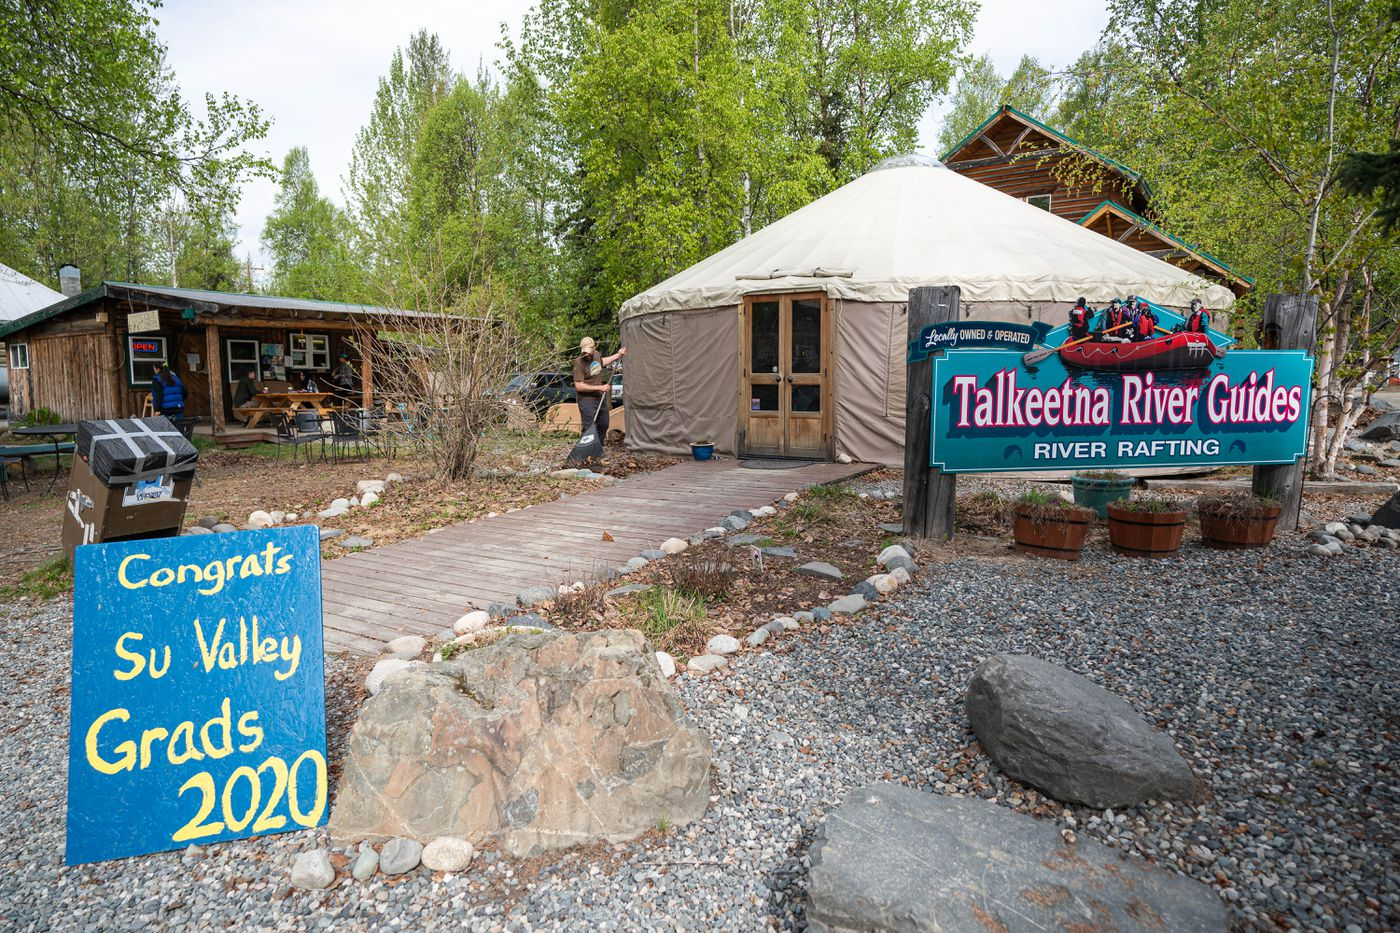 Scott Patridge rakes leaves outside of Talkeetna River Guides on Thursday, May 21, 2020. (Loren Holmes / ADN)